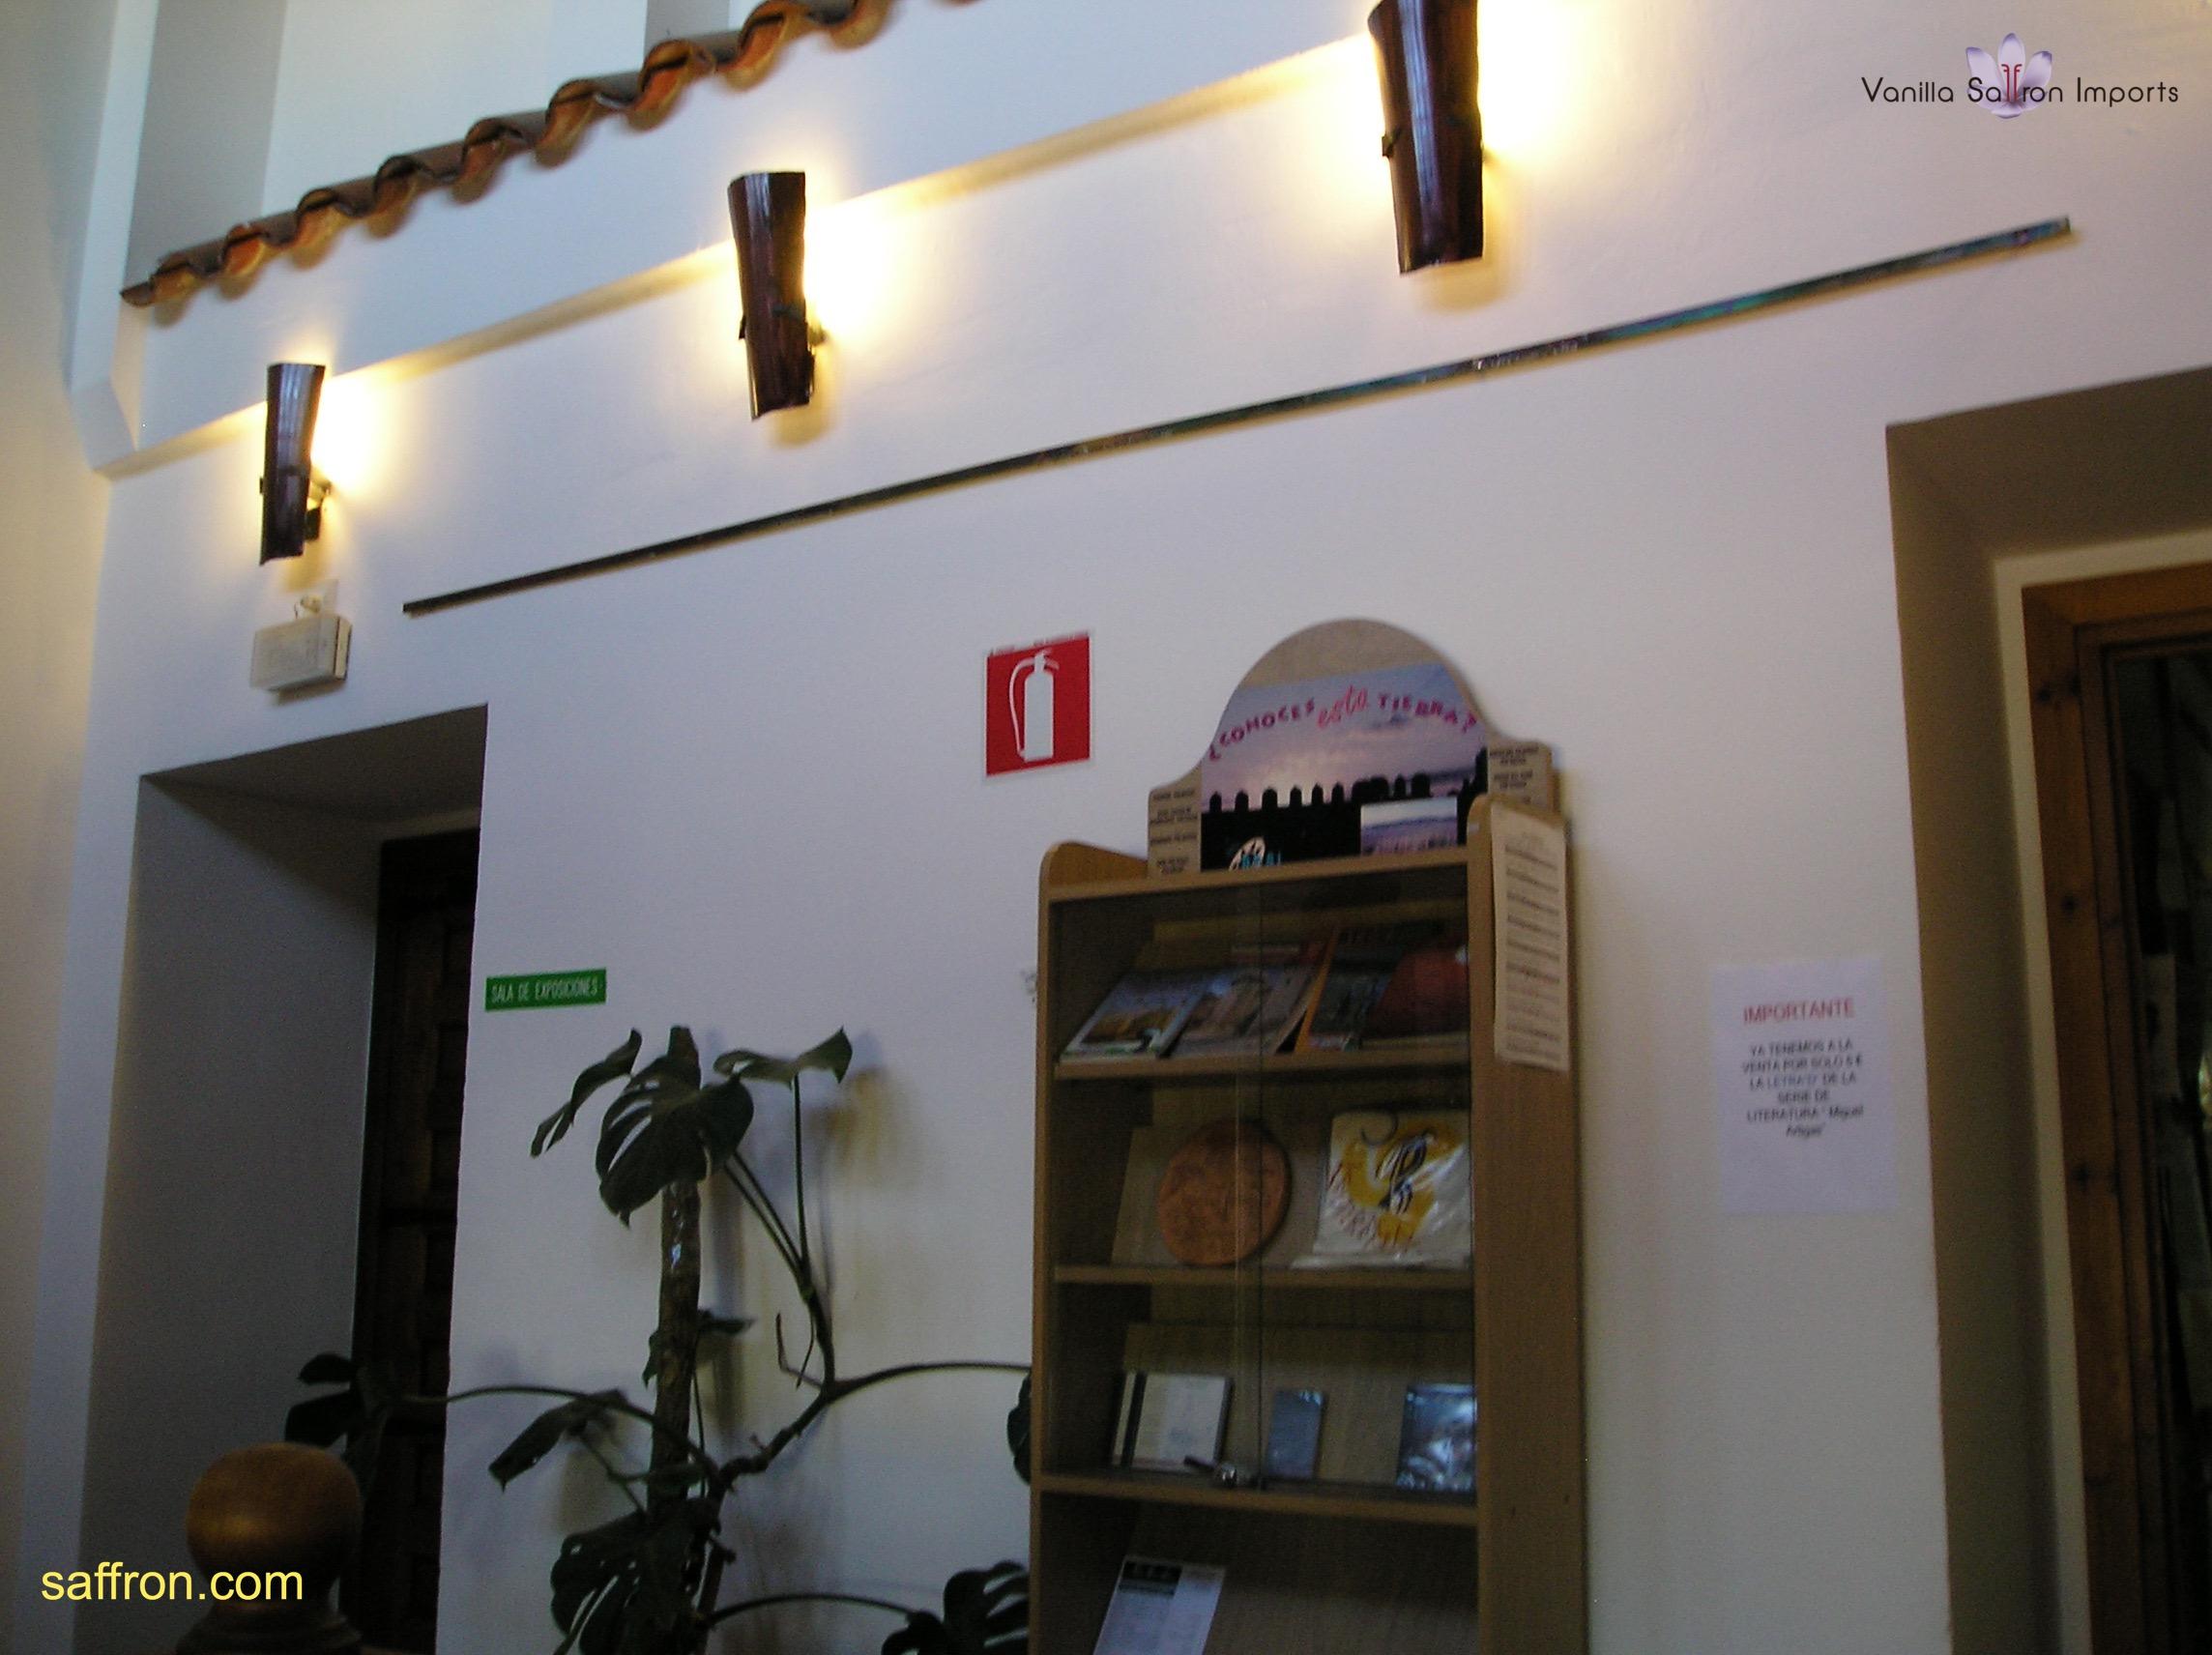 Vanilla, Saffron Imports Museo del Azafran, Monreal del Campo Teruel Spain 2004 682